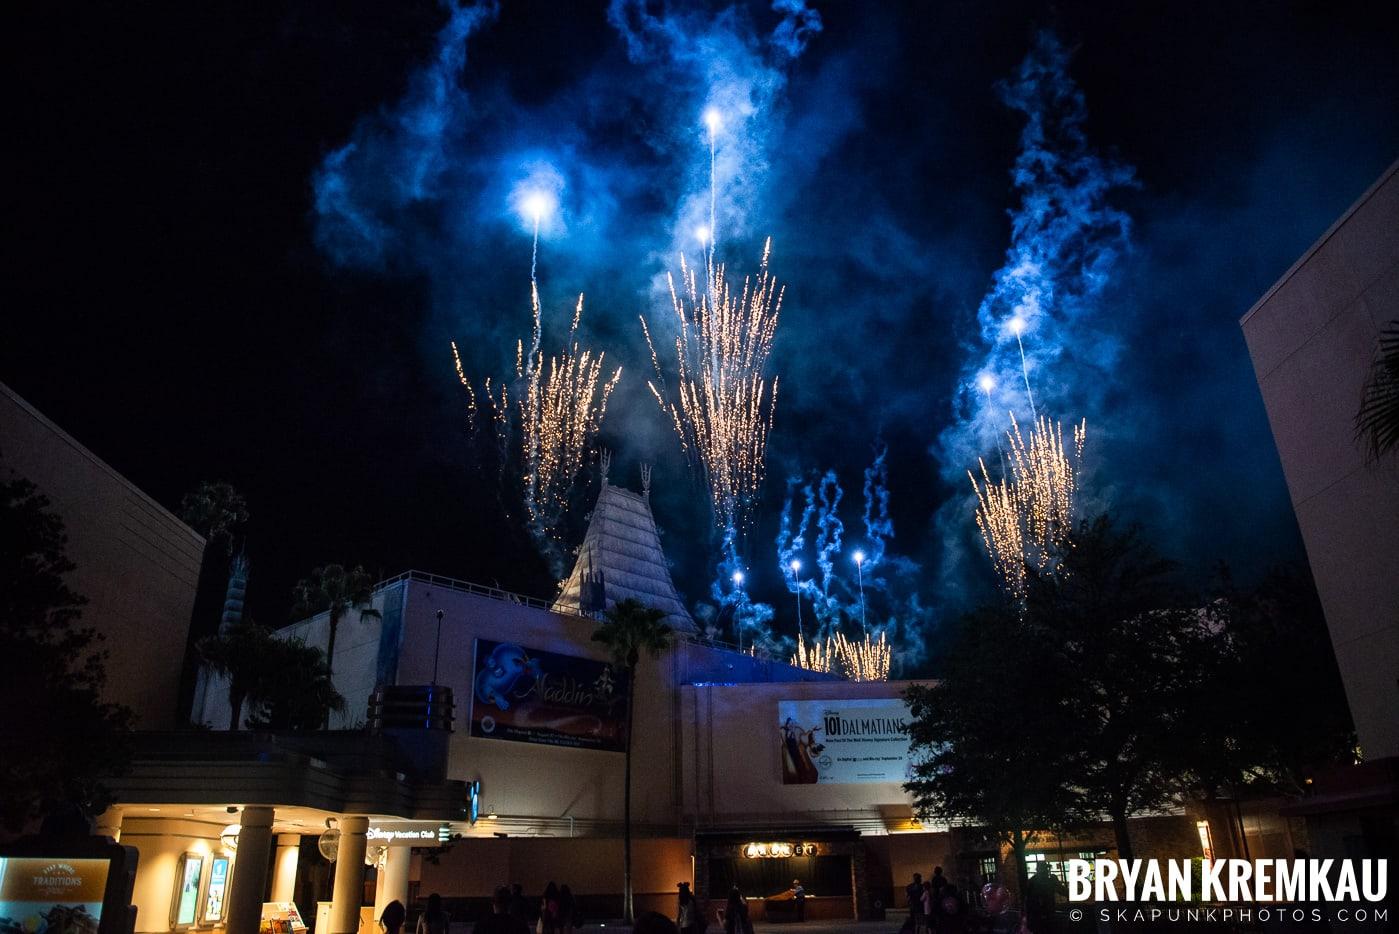 Walt Disney World Vacation: Day 5 (Animal Kingdom / Disney's Hollywood Studios) - 10.3.19 (1)